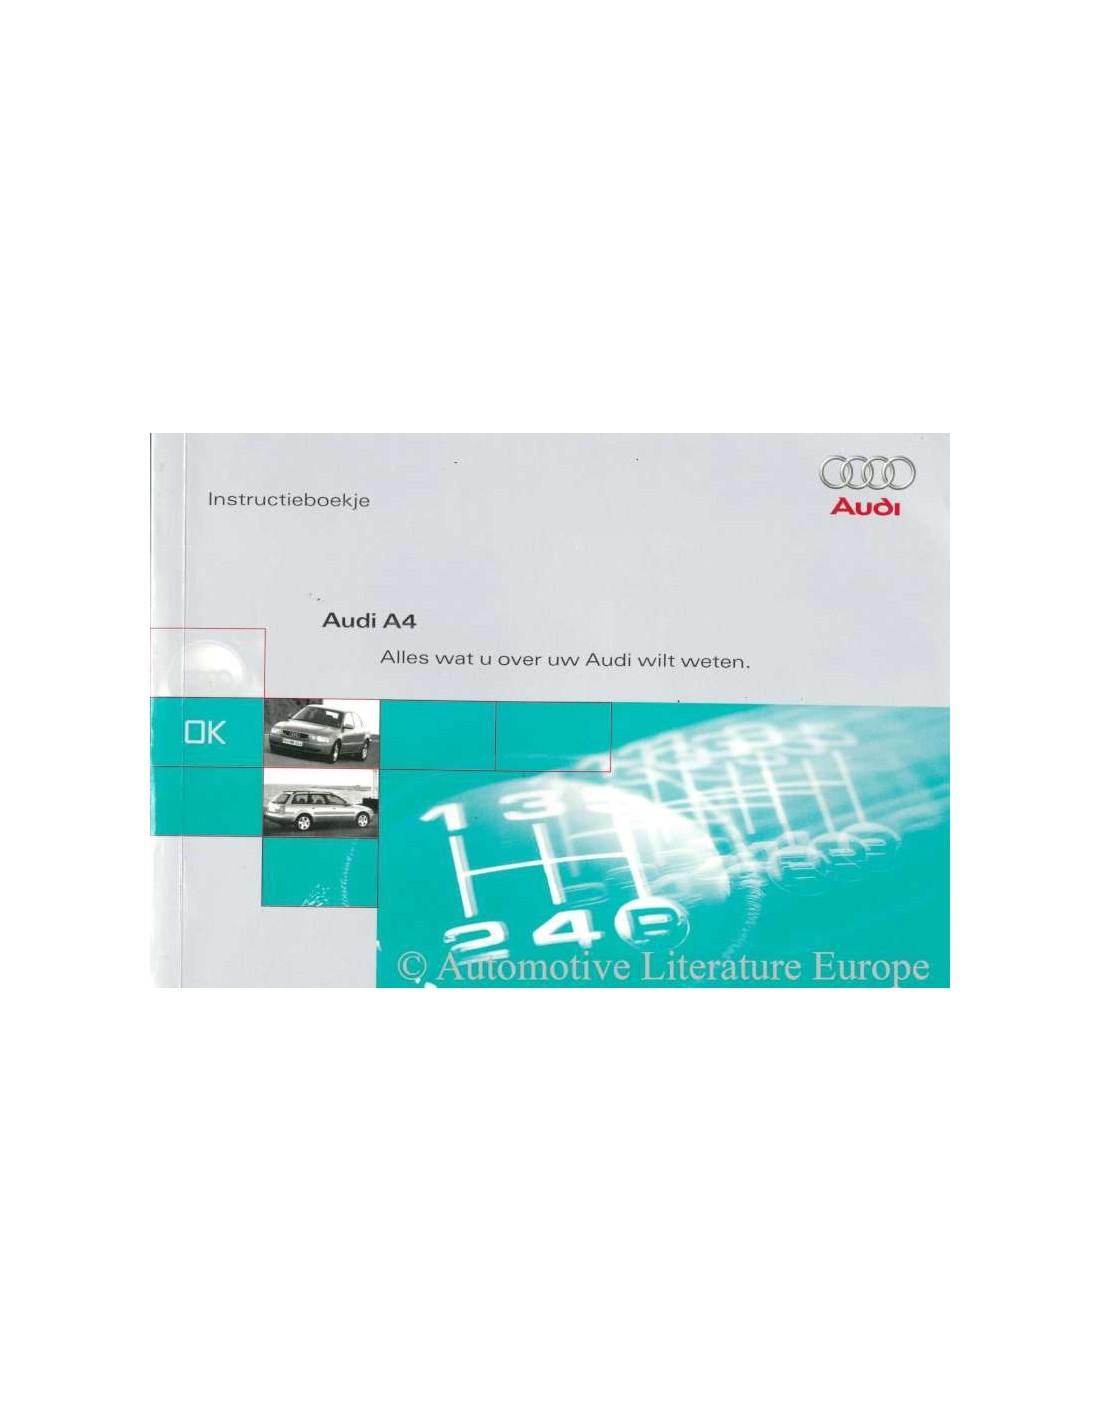 1997 audi a4 owners manual handbook dutch rh autolit eu 1998 Audi A4 audi a4 1997 owners manual free download